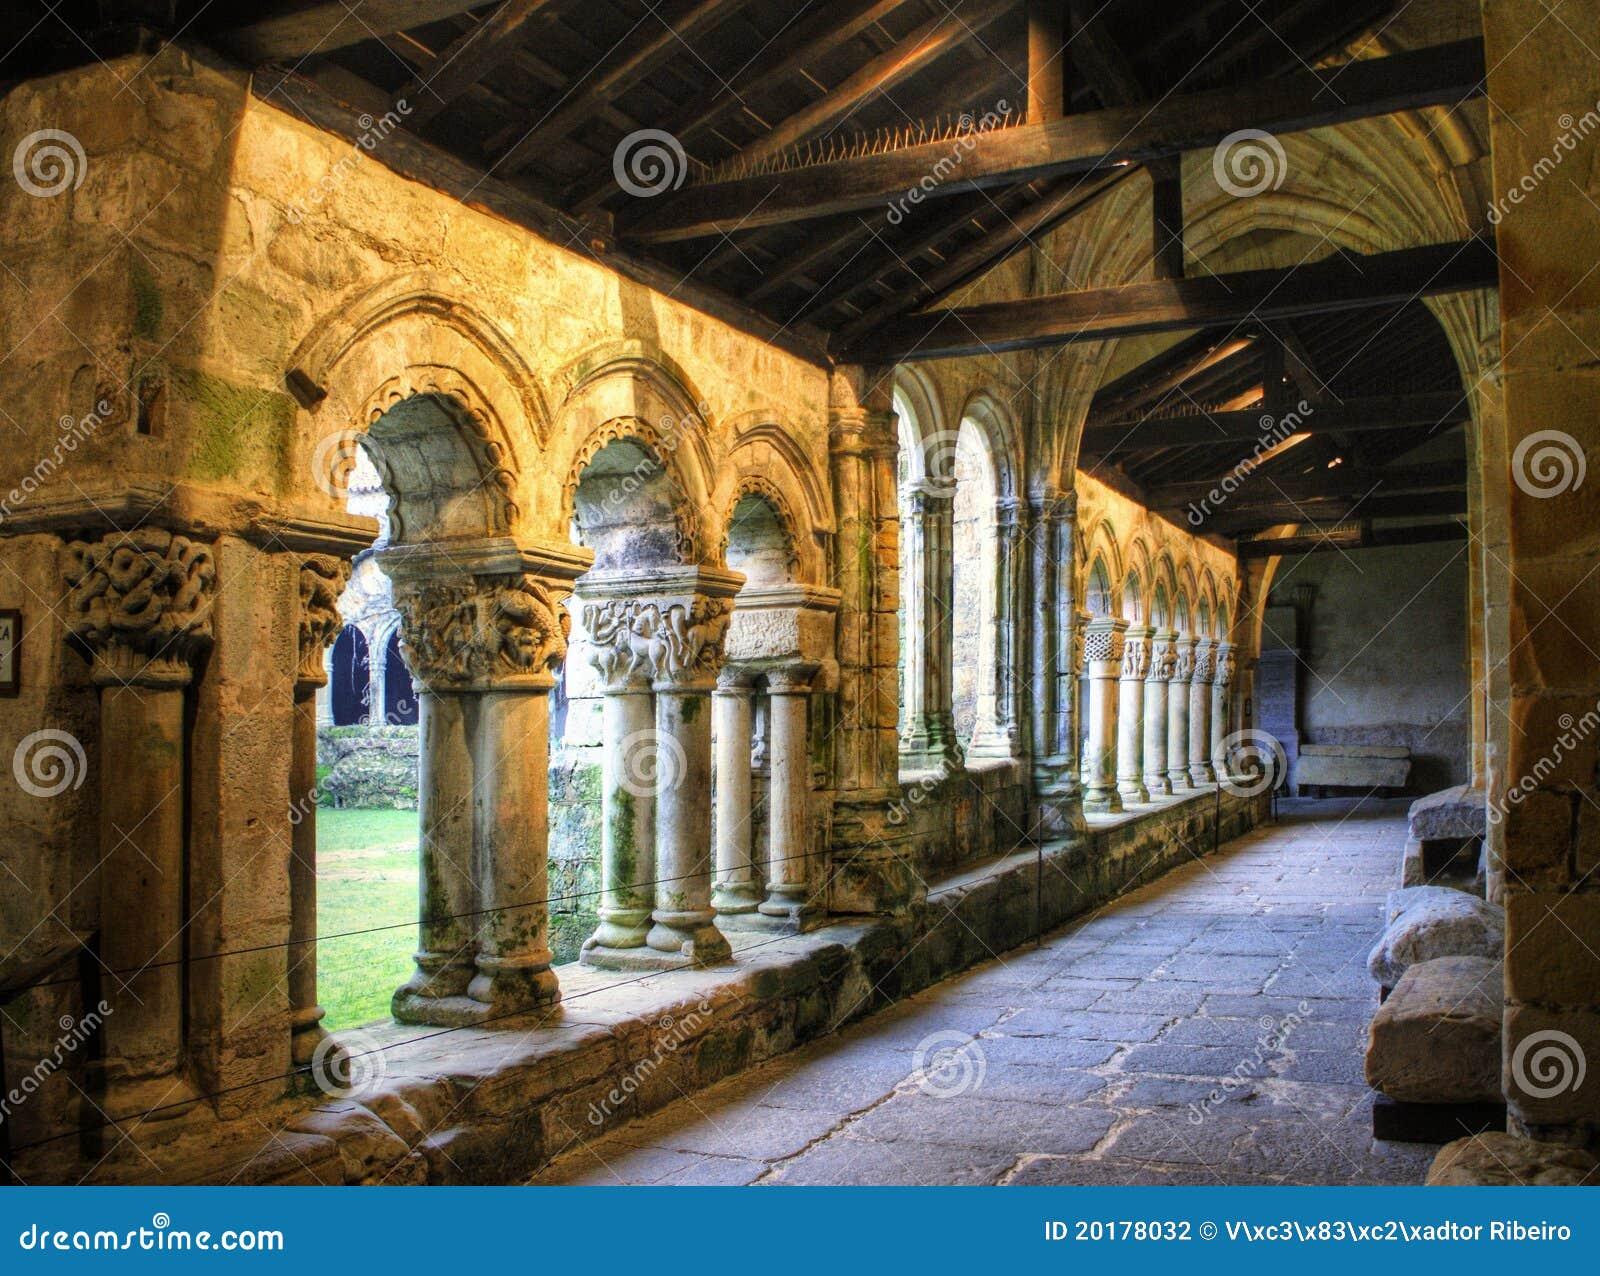 Romanesque cloister of Collegiata Santa Juliana